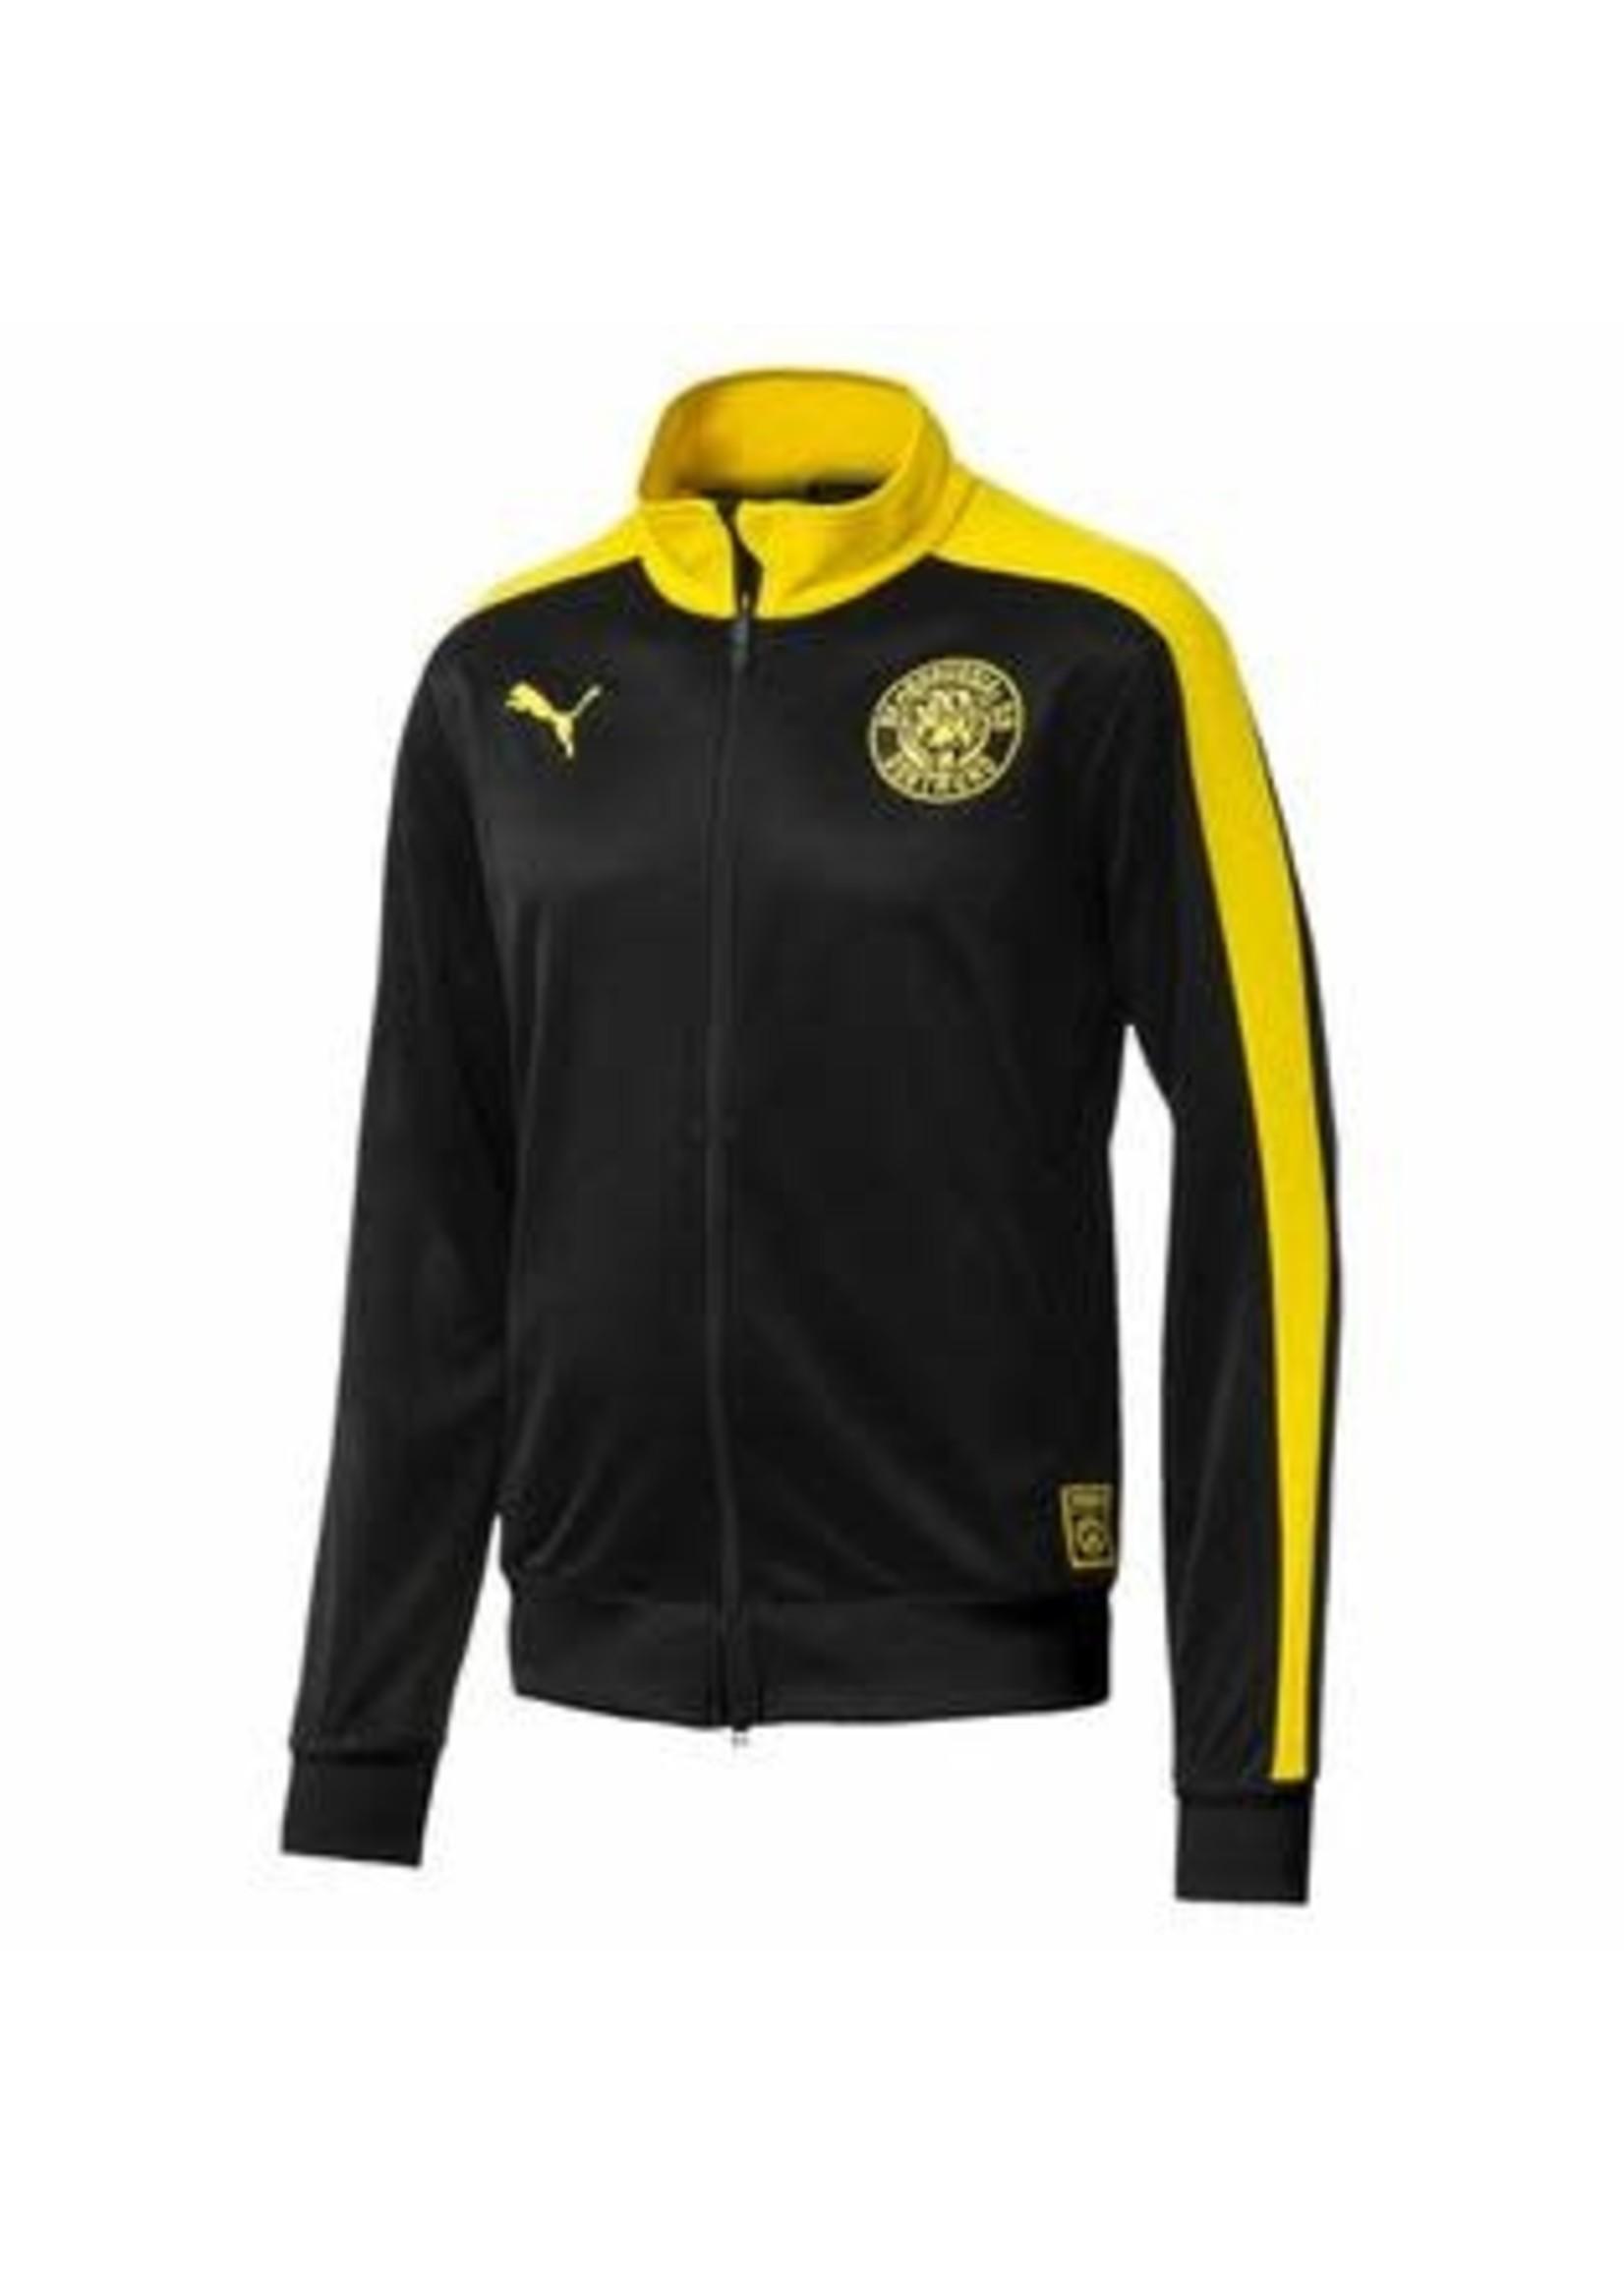 Puma Borussia Dortmund Track Jacket - 754101 02